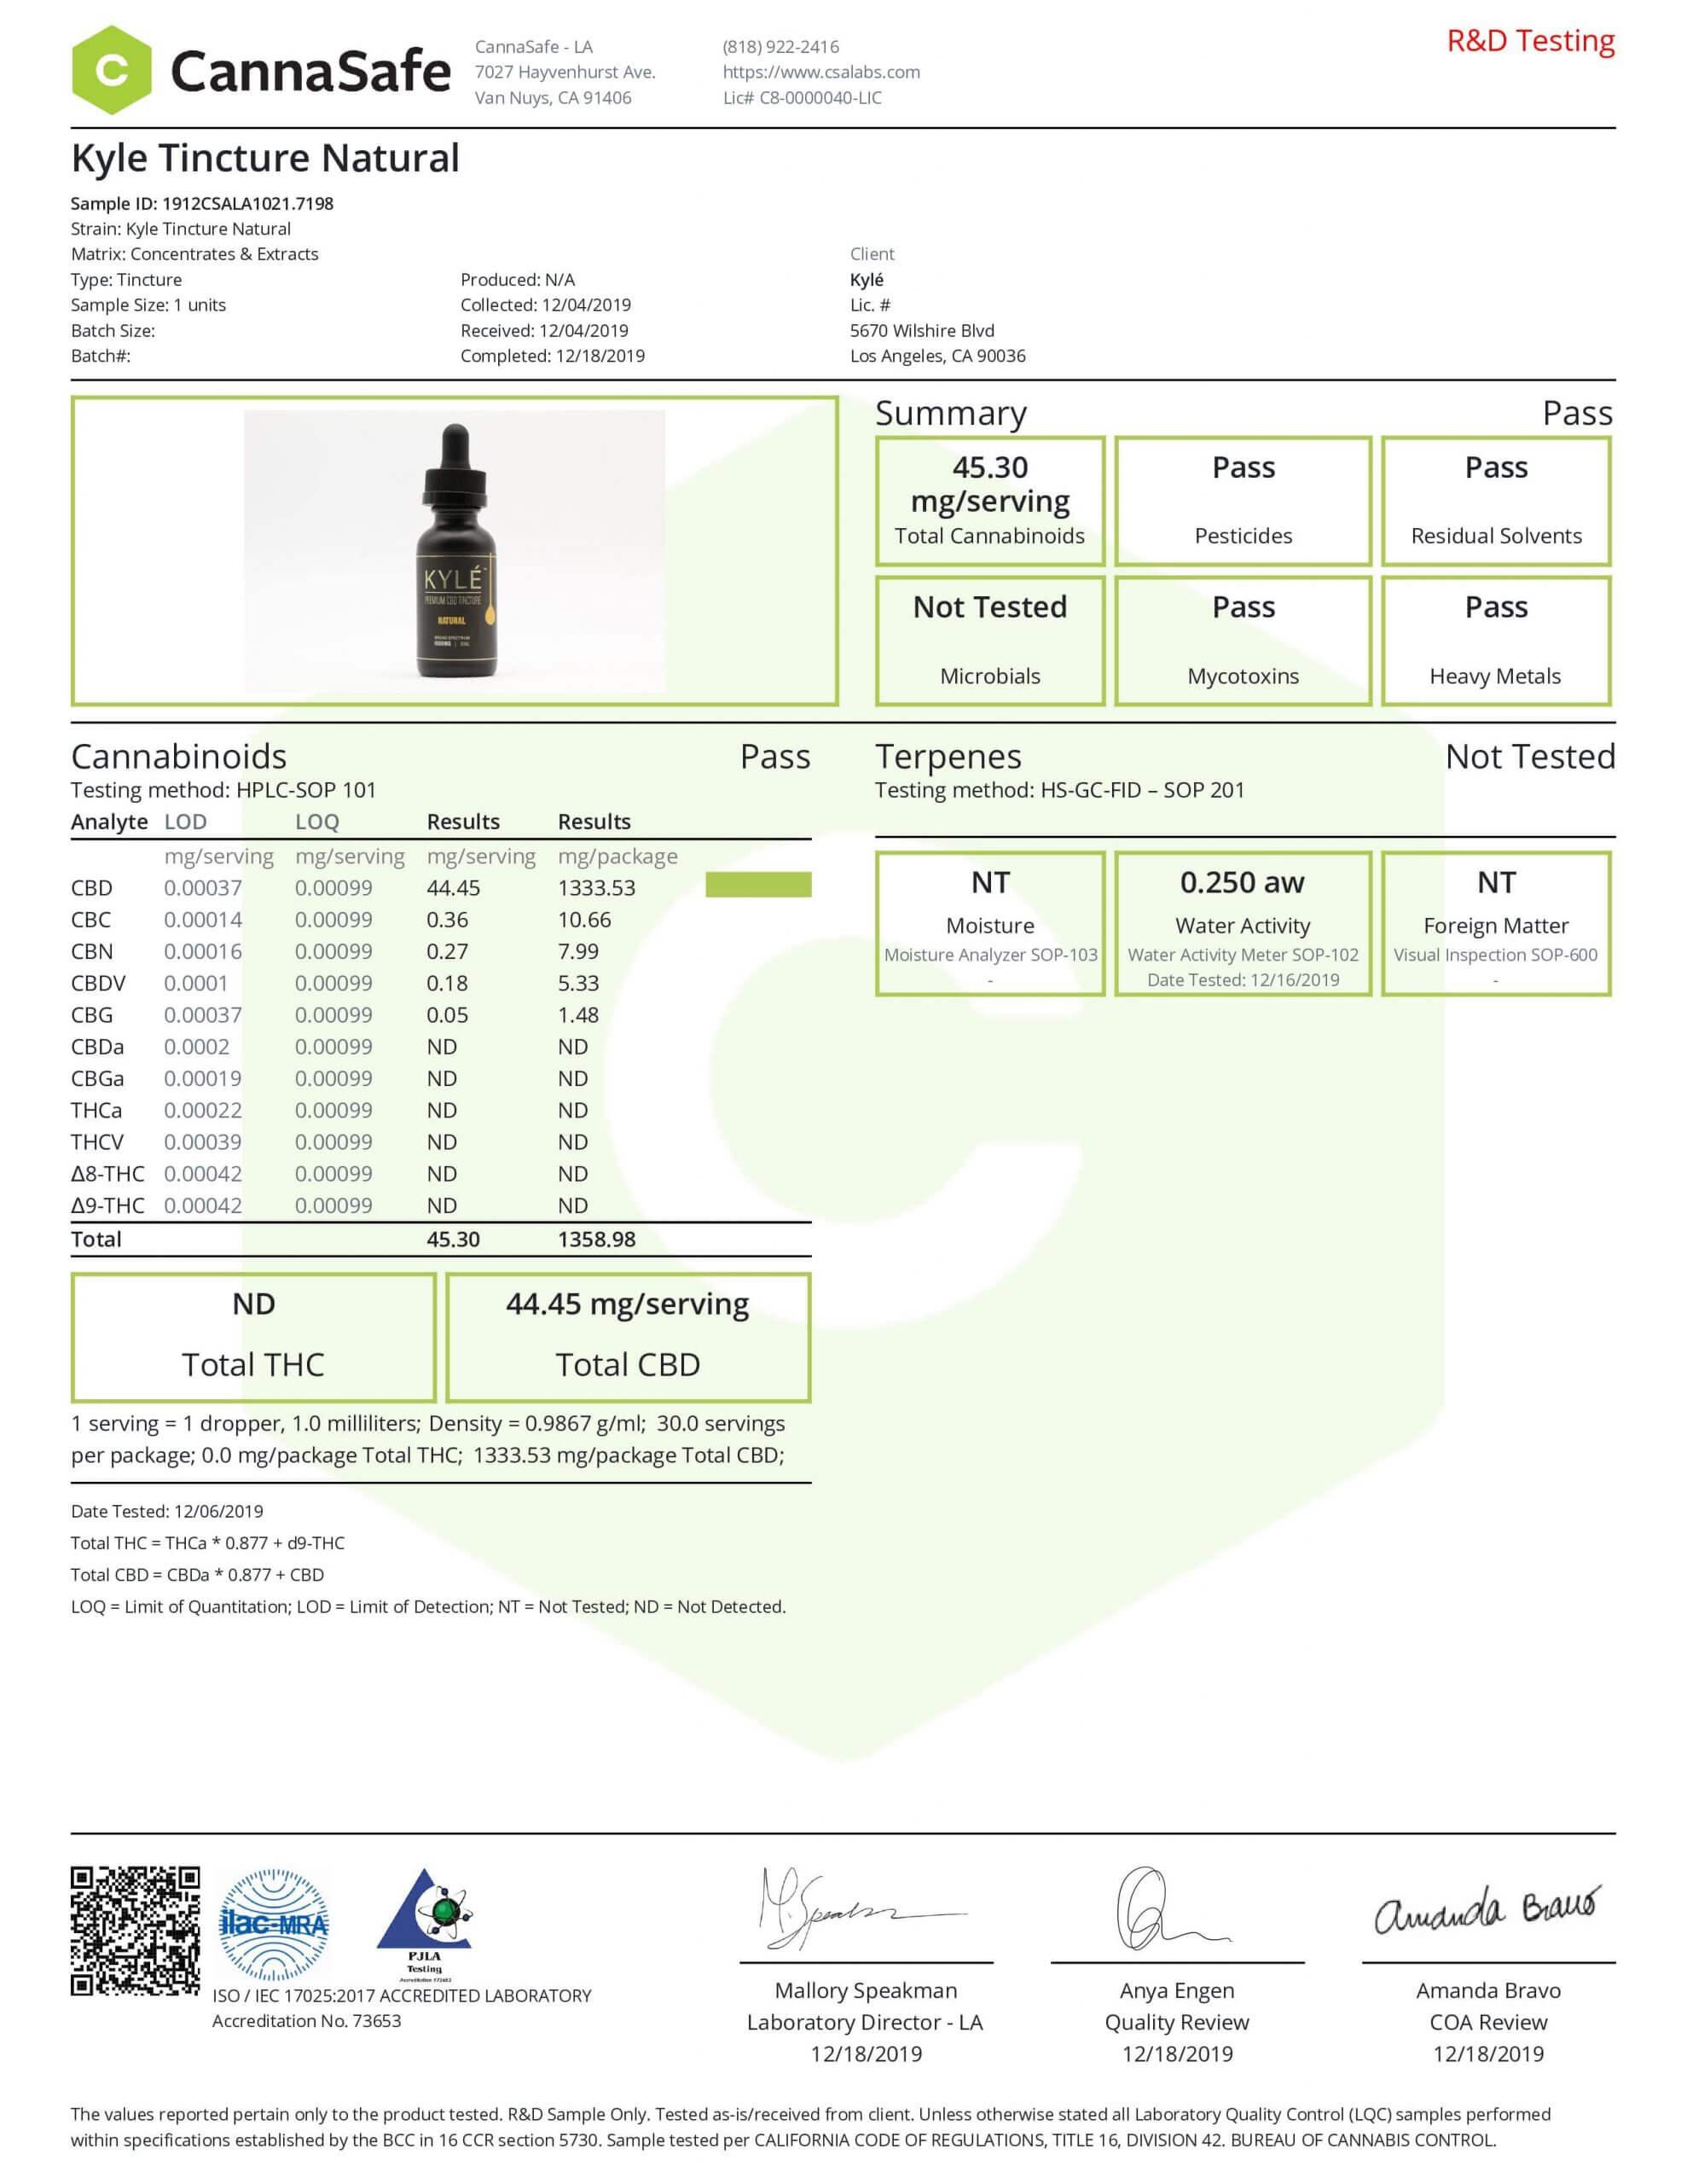 KYLE CBD Gold Natural Drop Lab Report Tincture Oil 1000mg